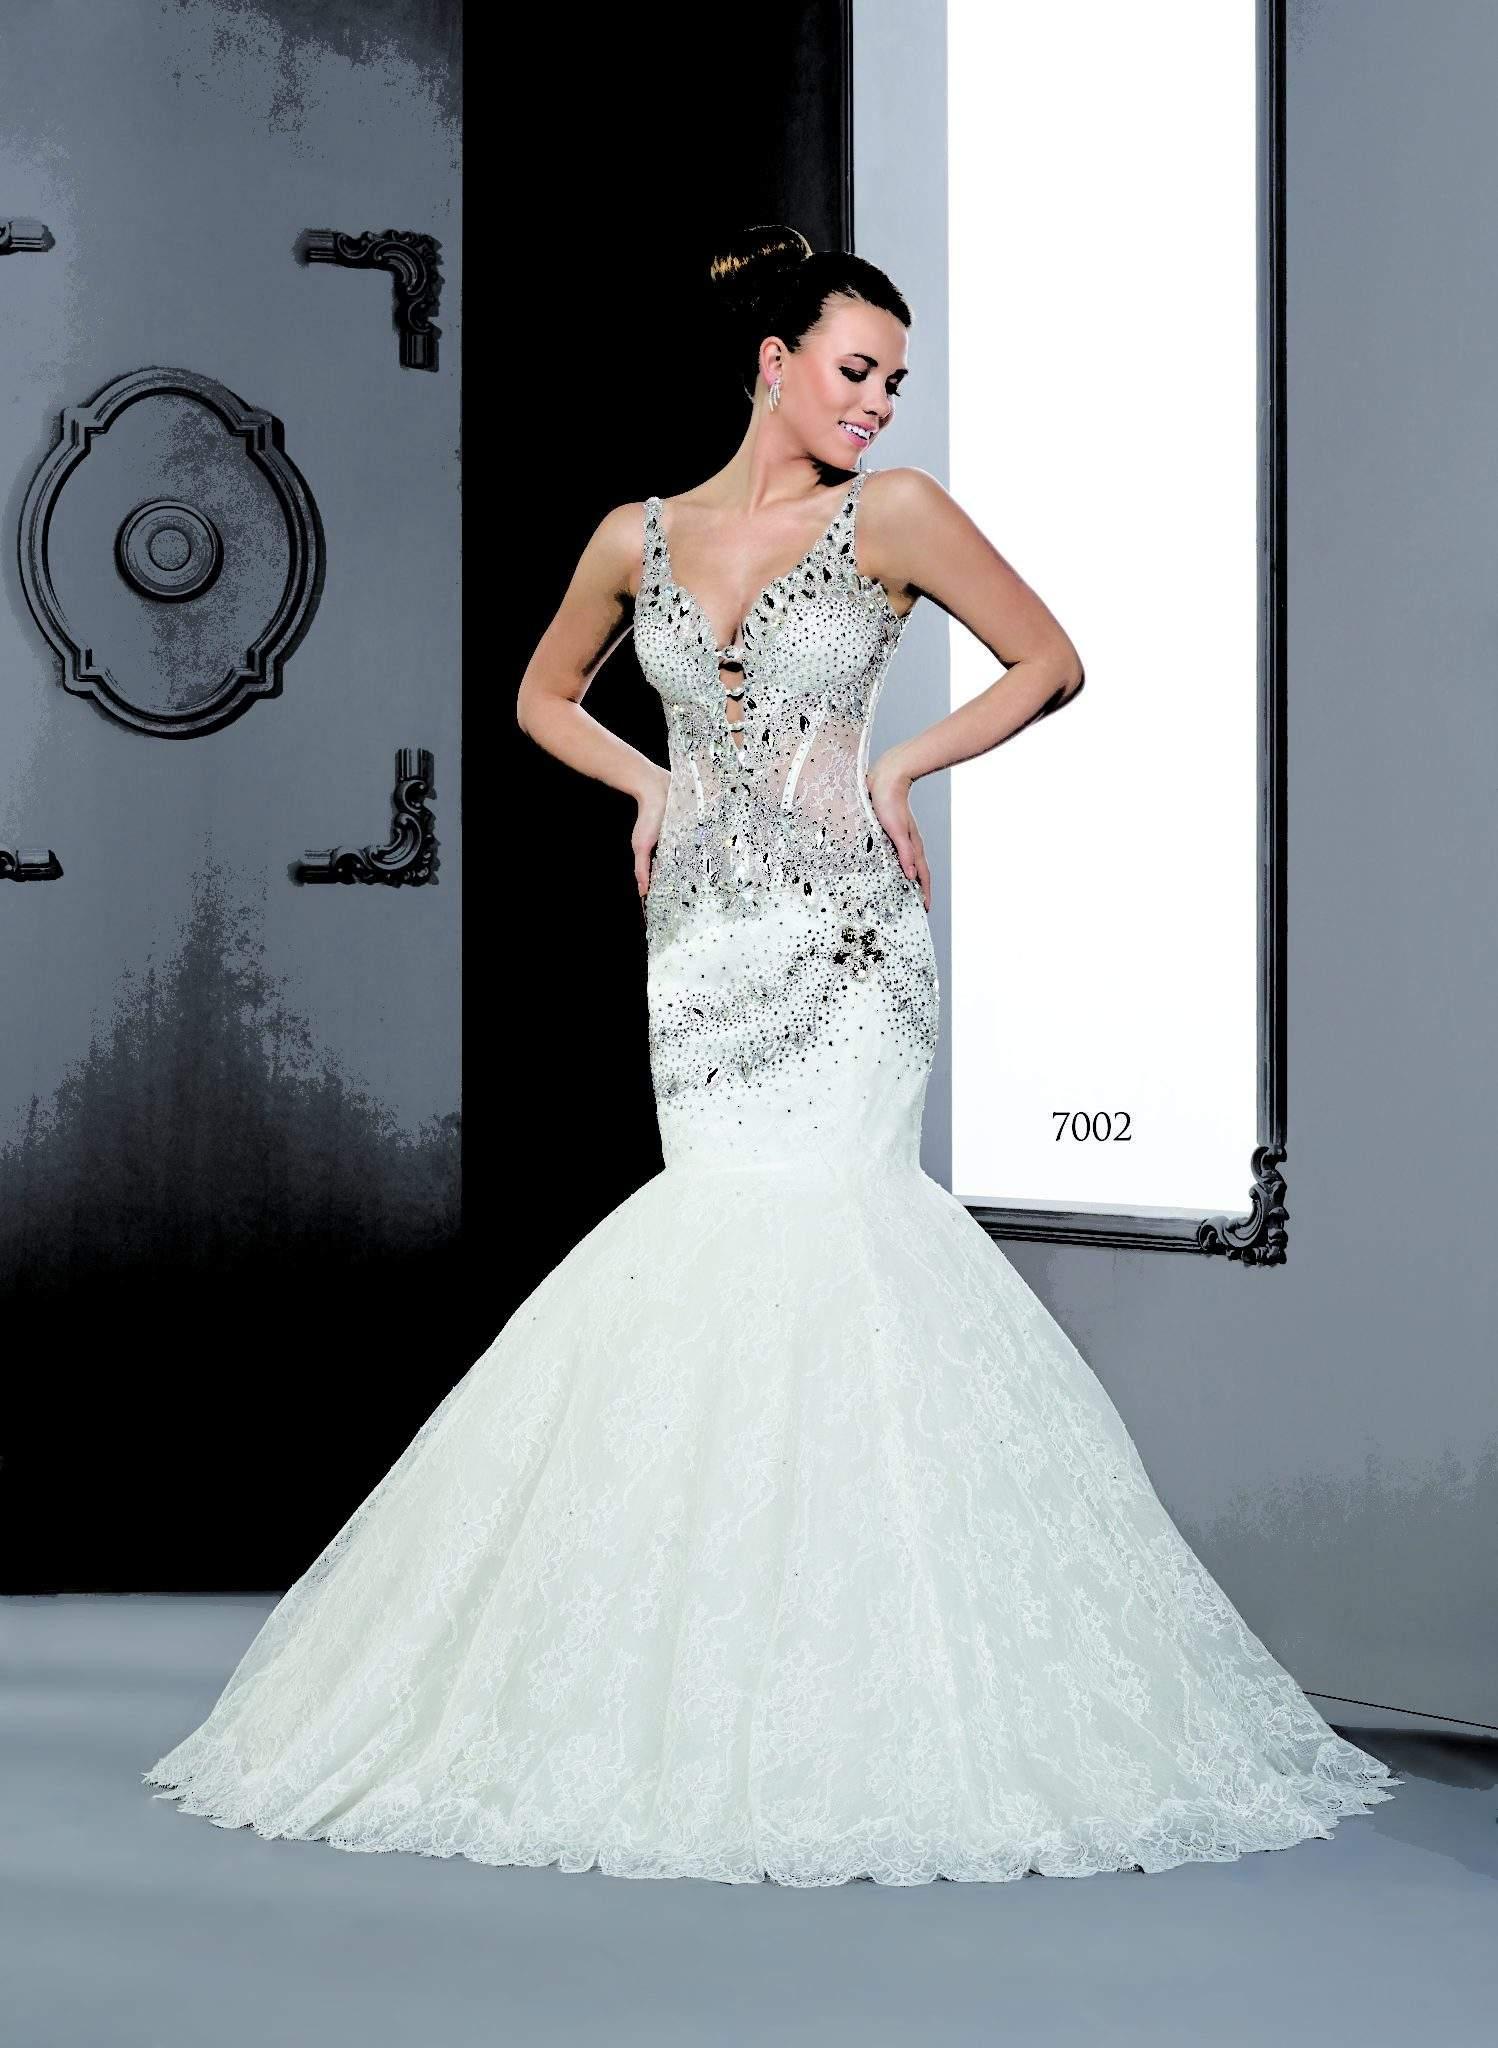 Heavily beaded wedding dresses with swarovski crystals by for Heavy beaded wedding dresses